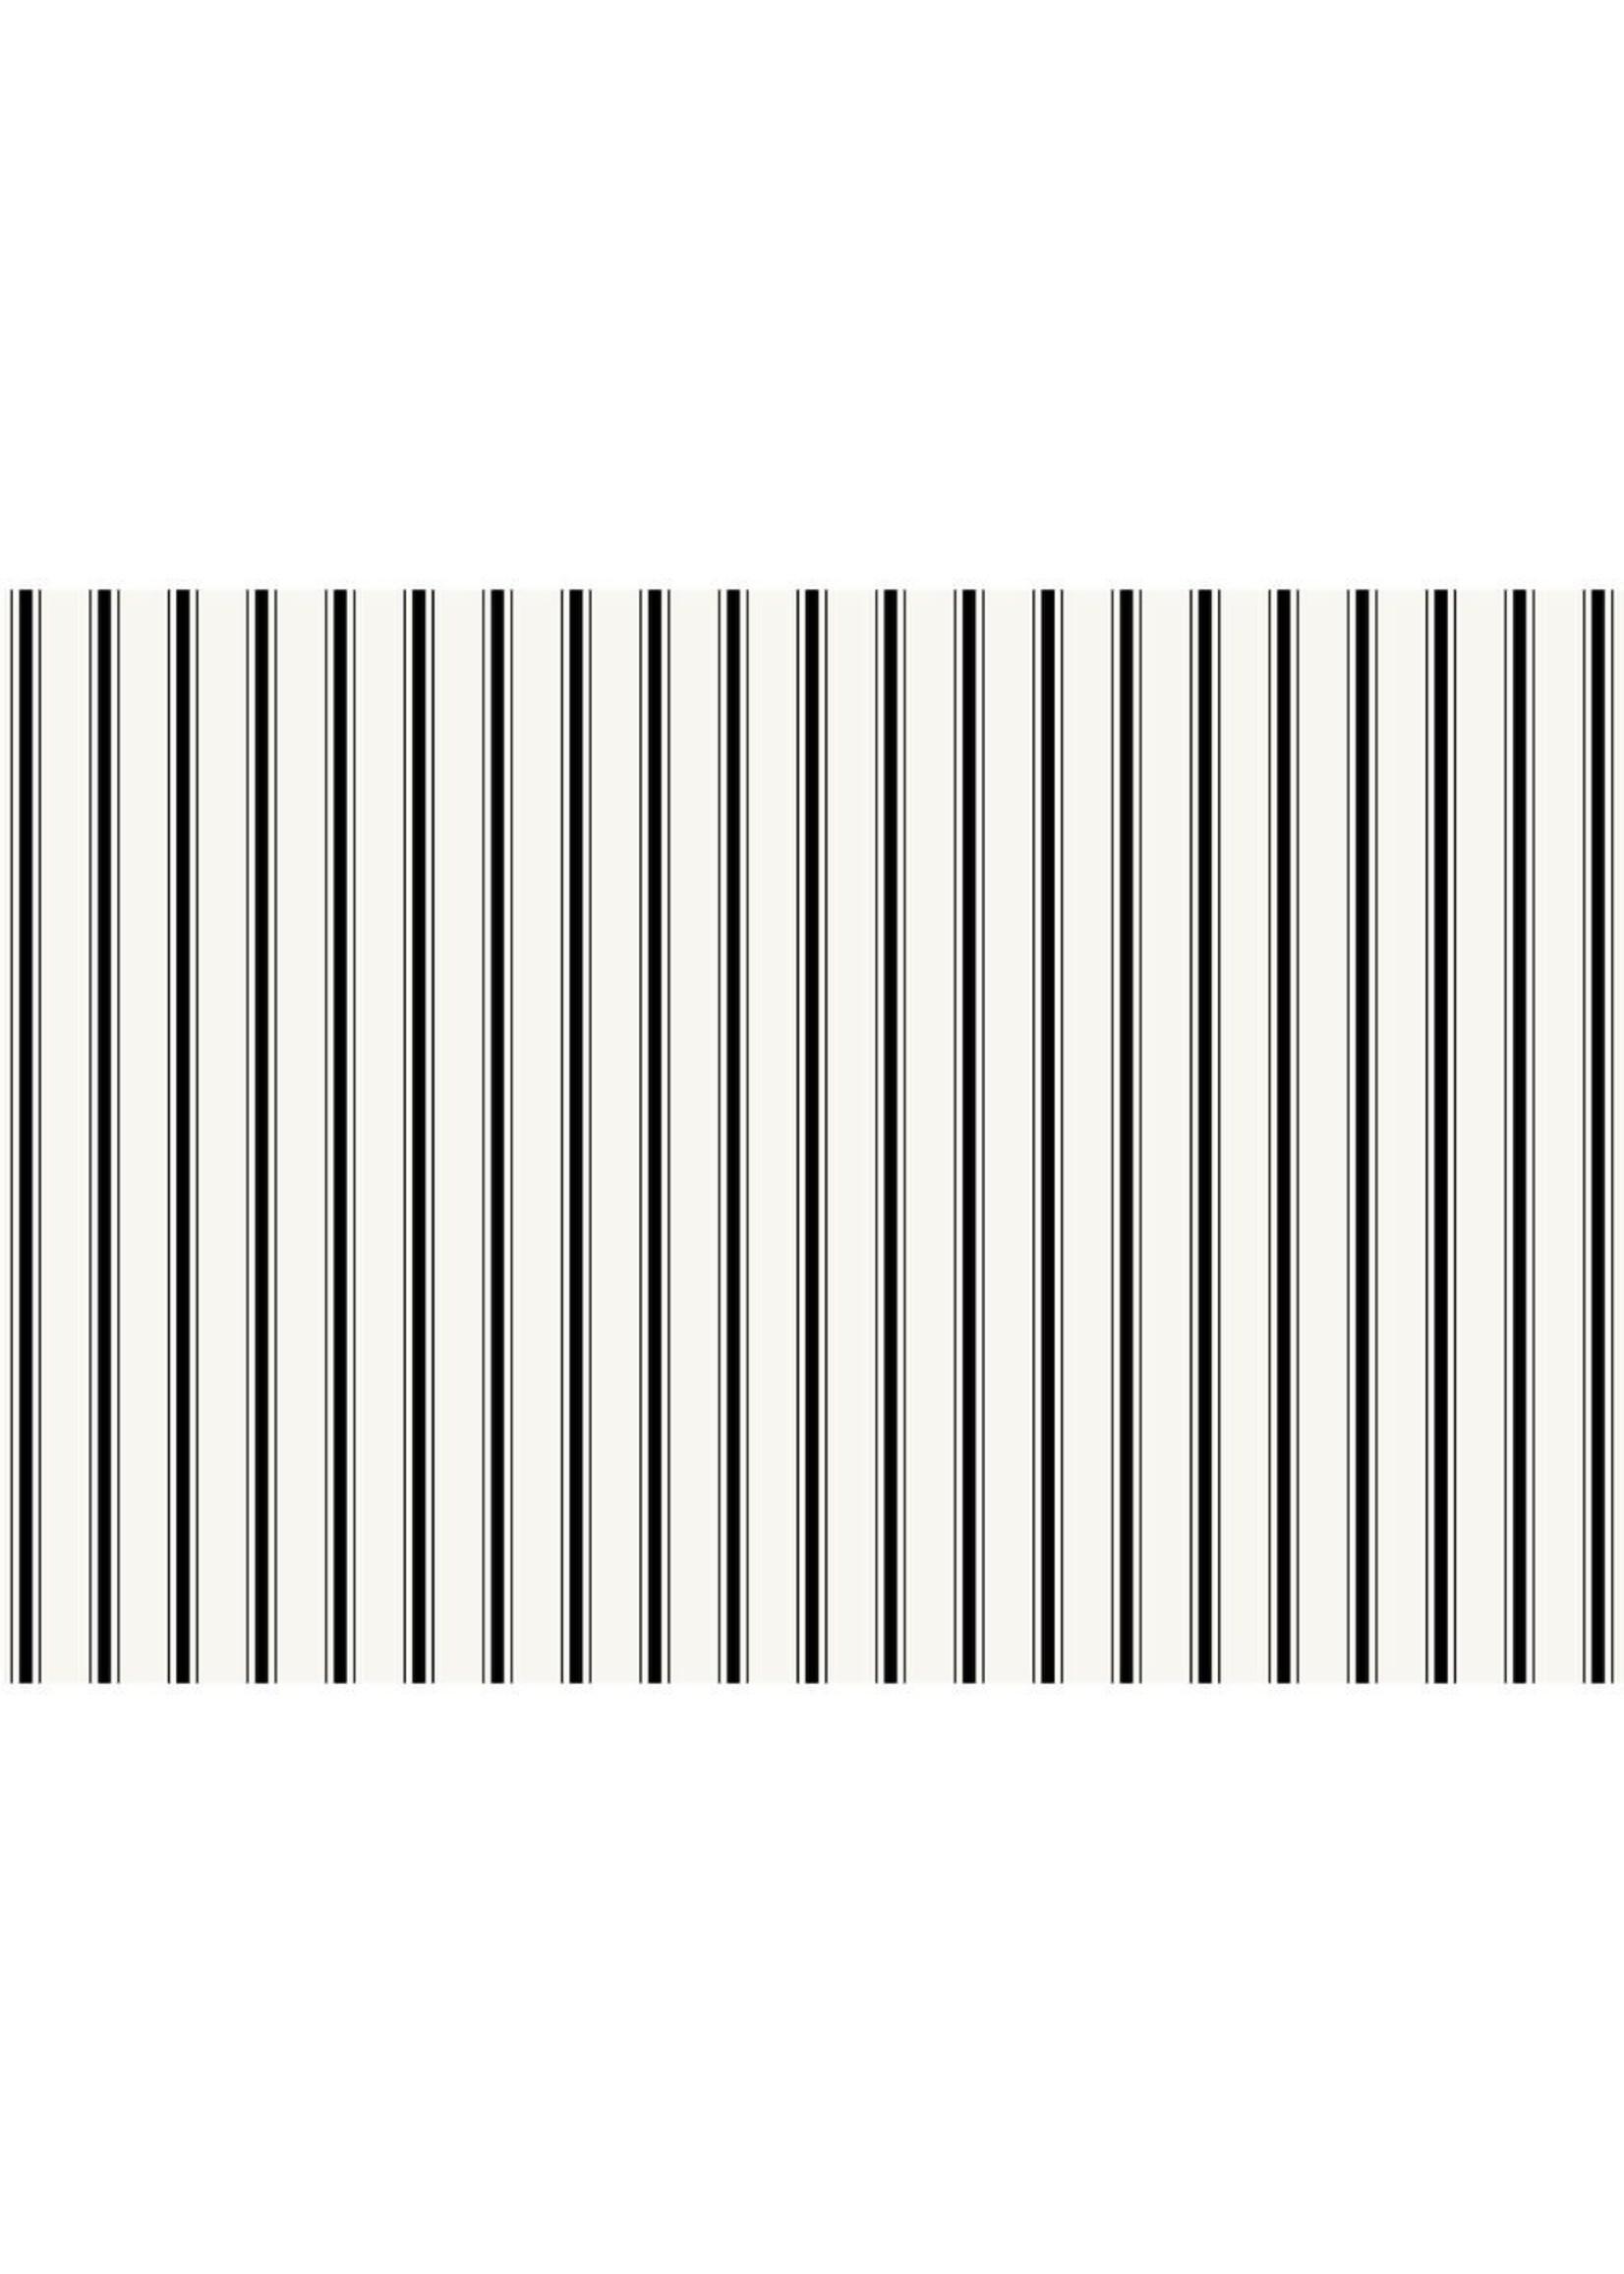 Hester & Cook Paper Placemats - Ribbon Stripe Black